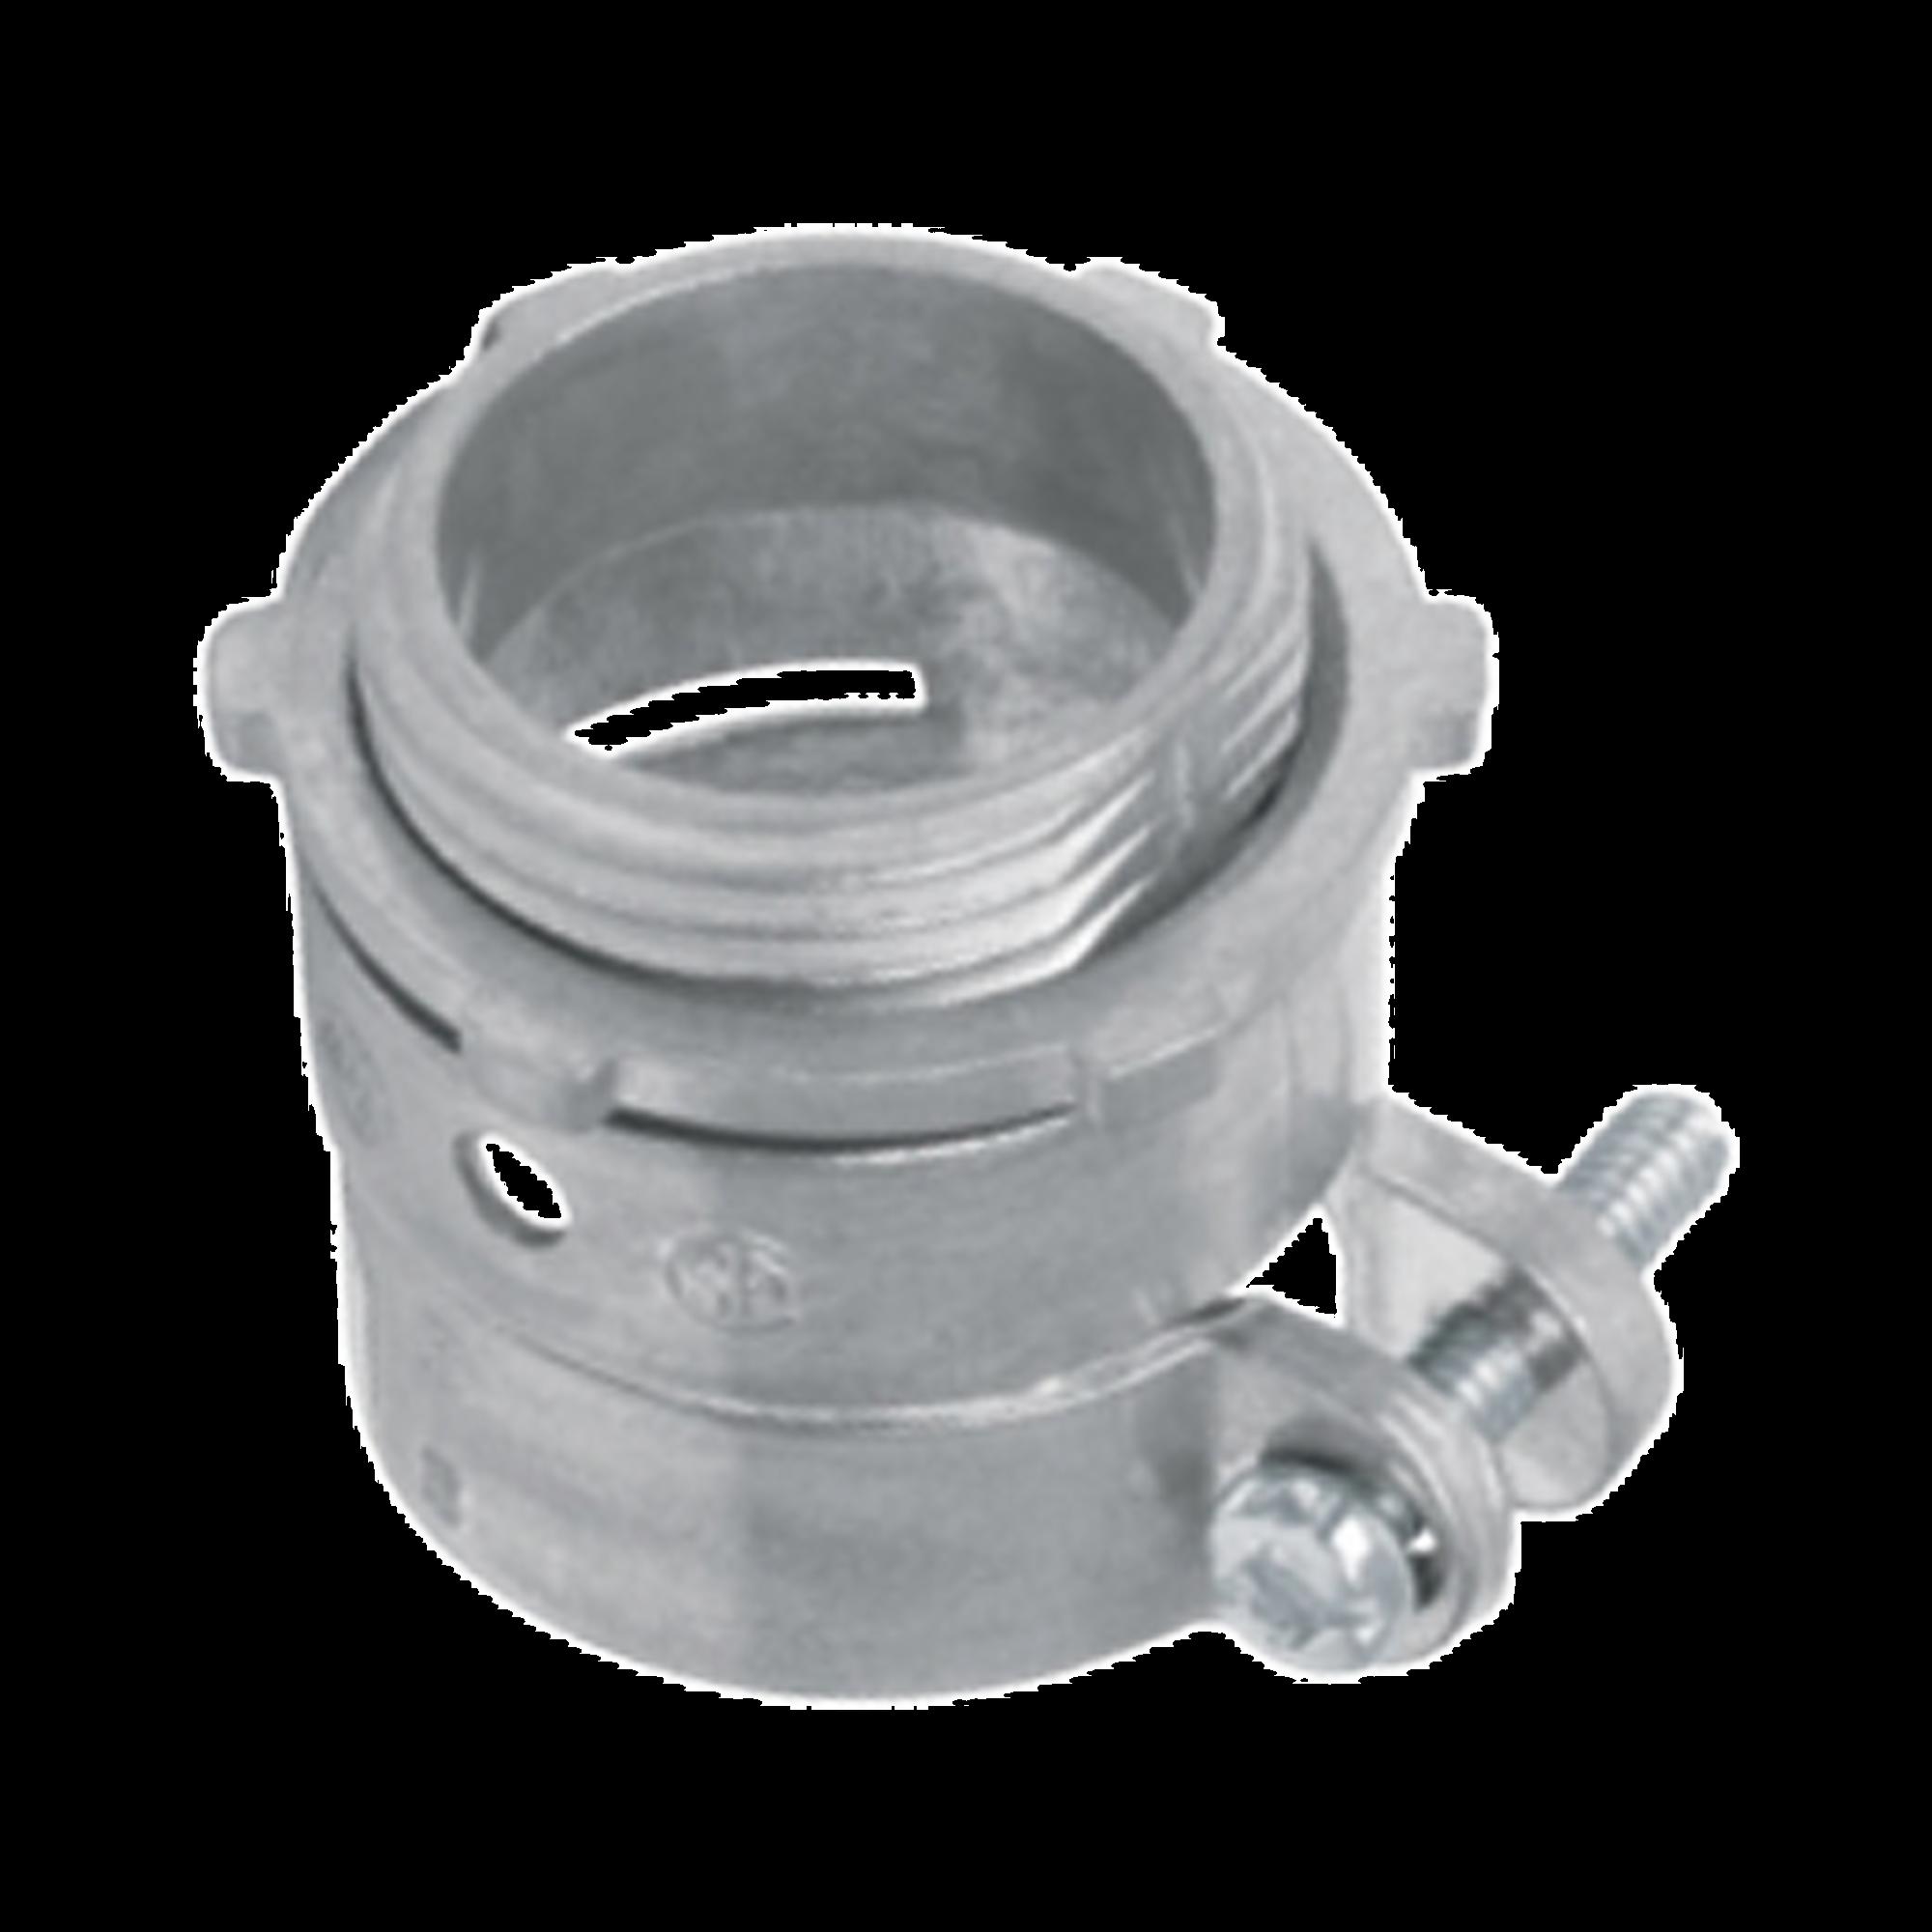 Conector recto para tubo flexible de 3/4 (19 mm)